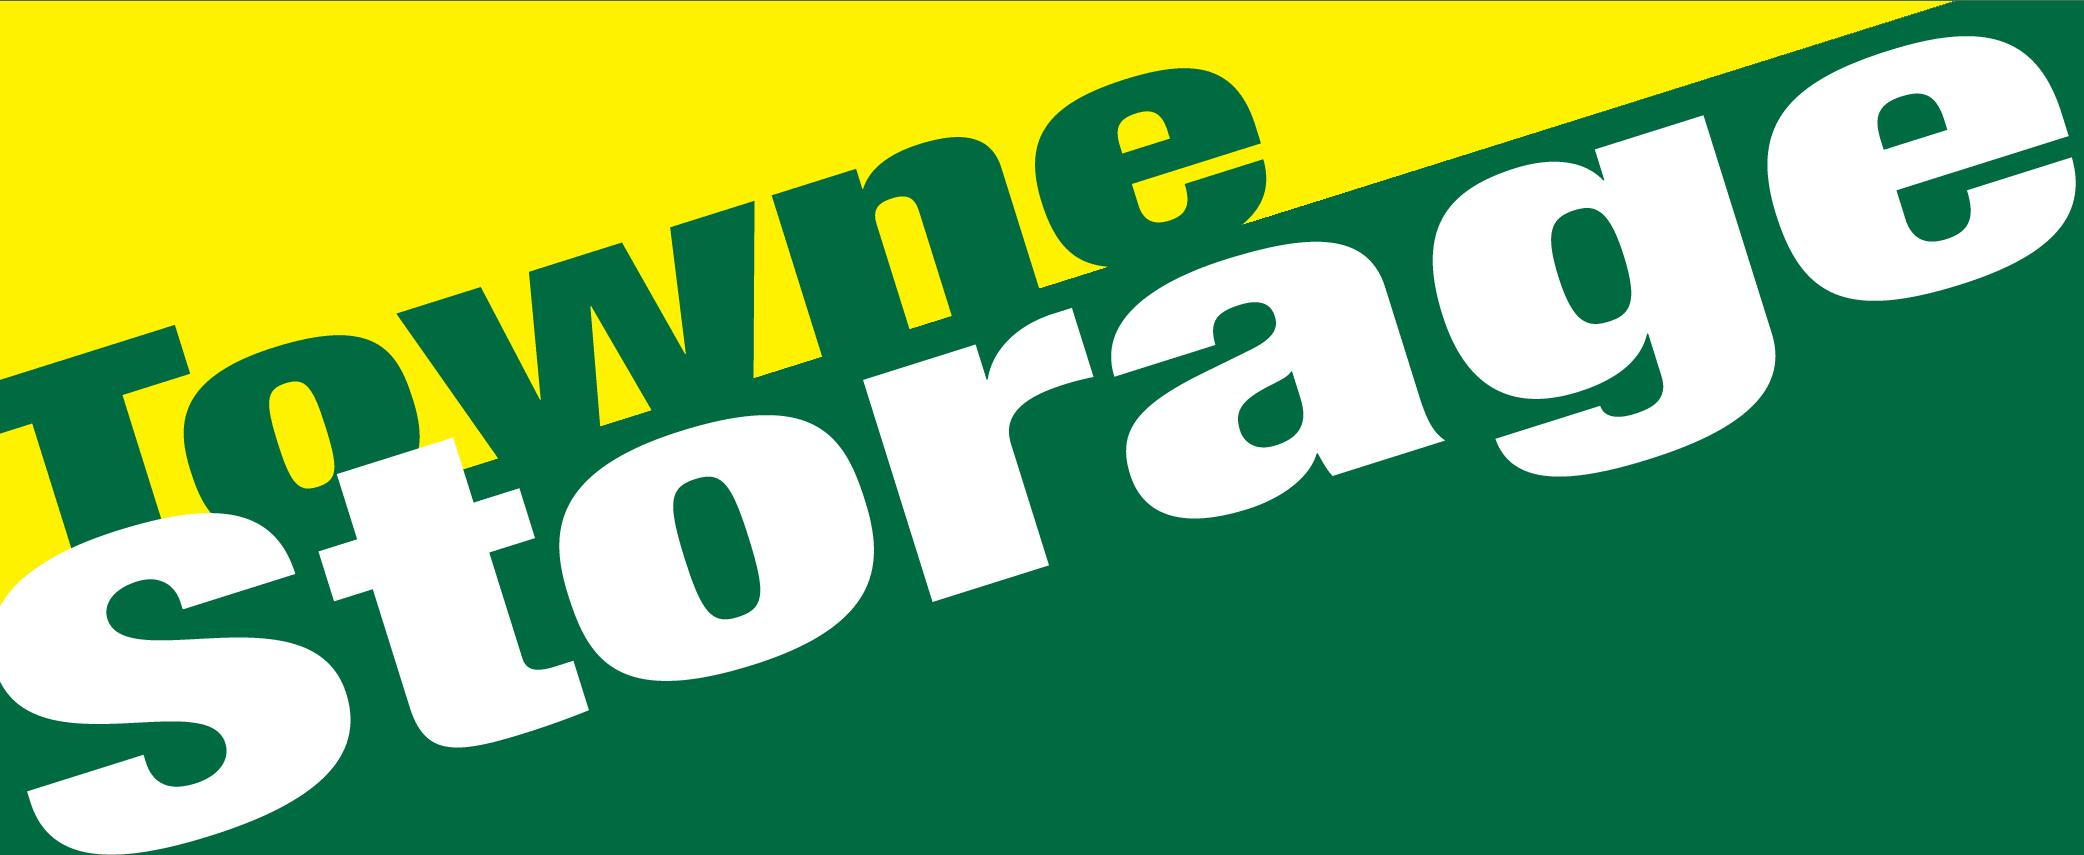 Towne Storage - Herriman logo